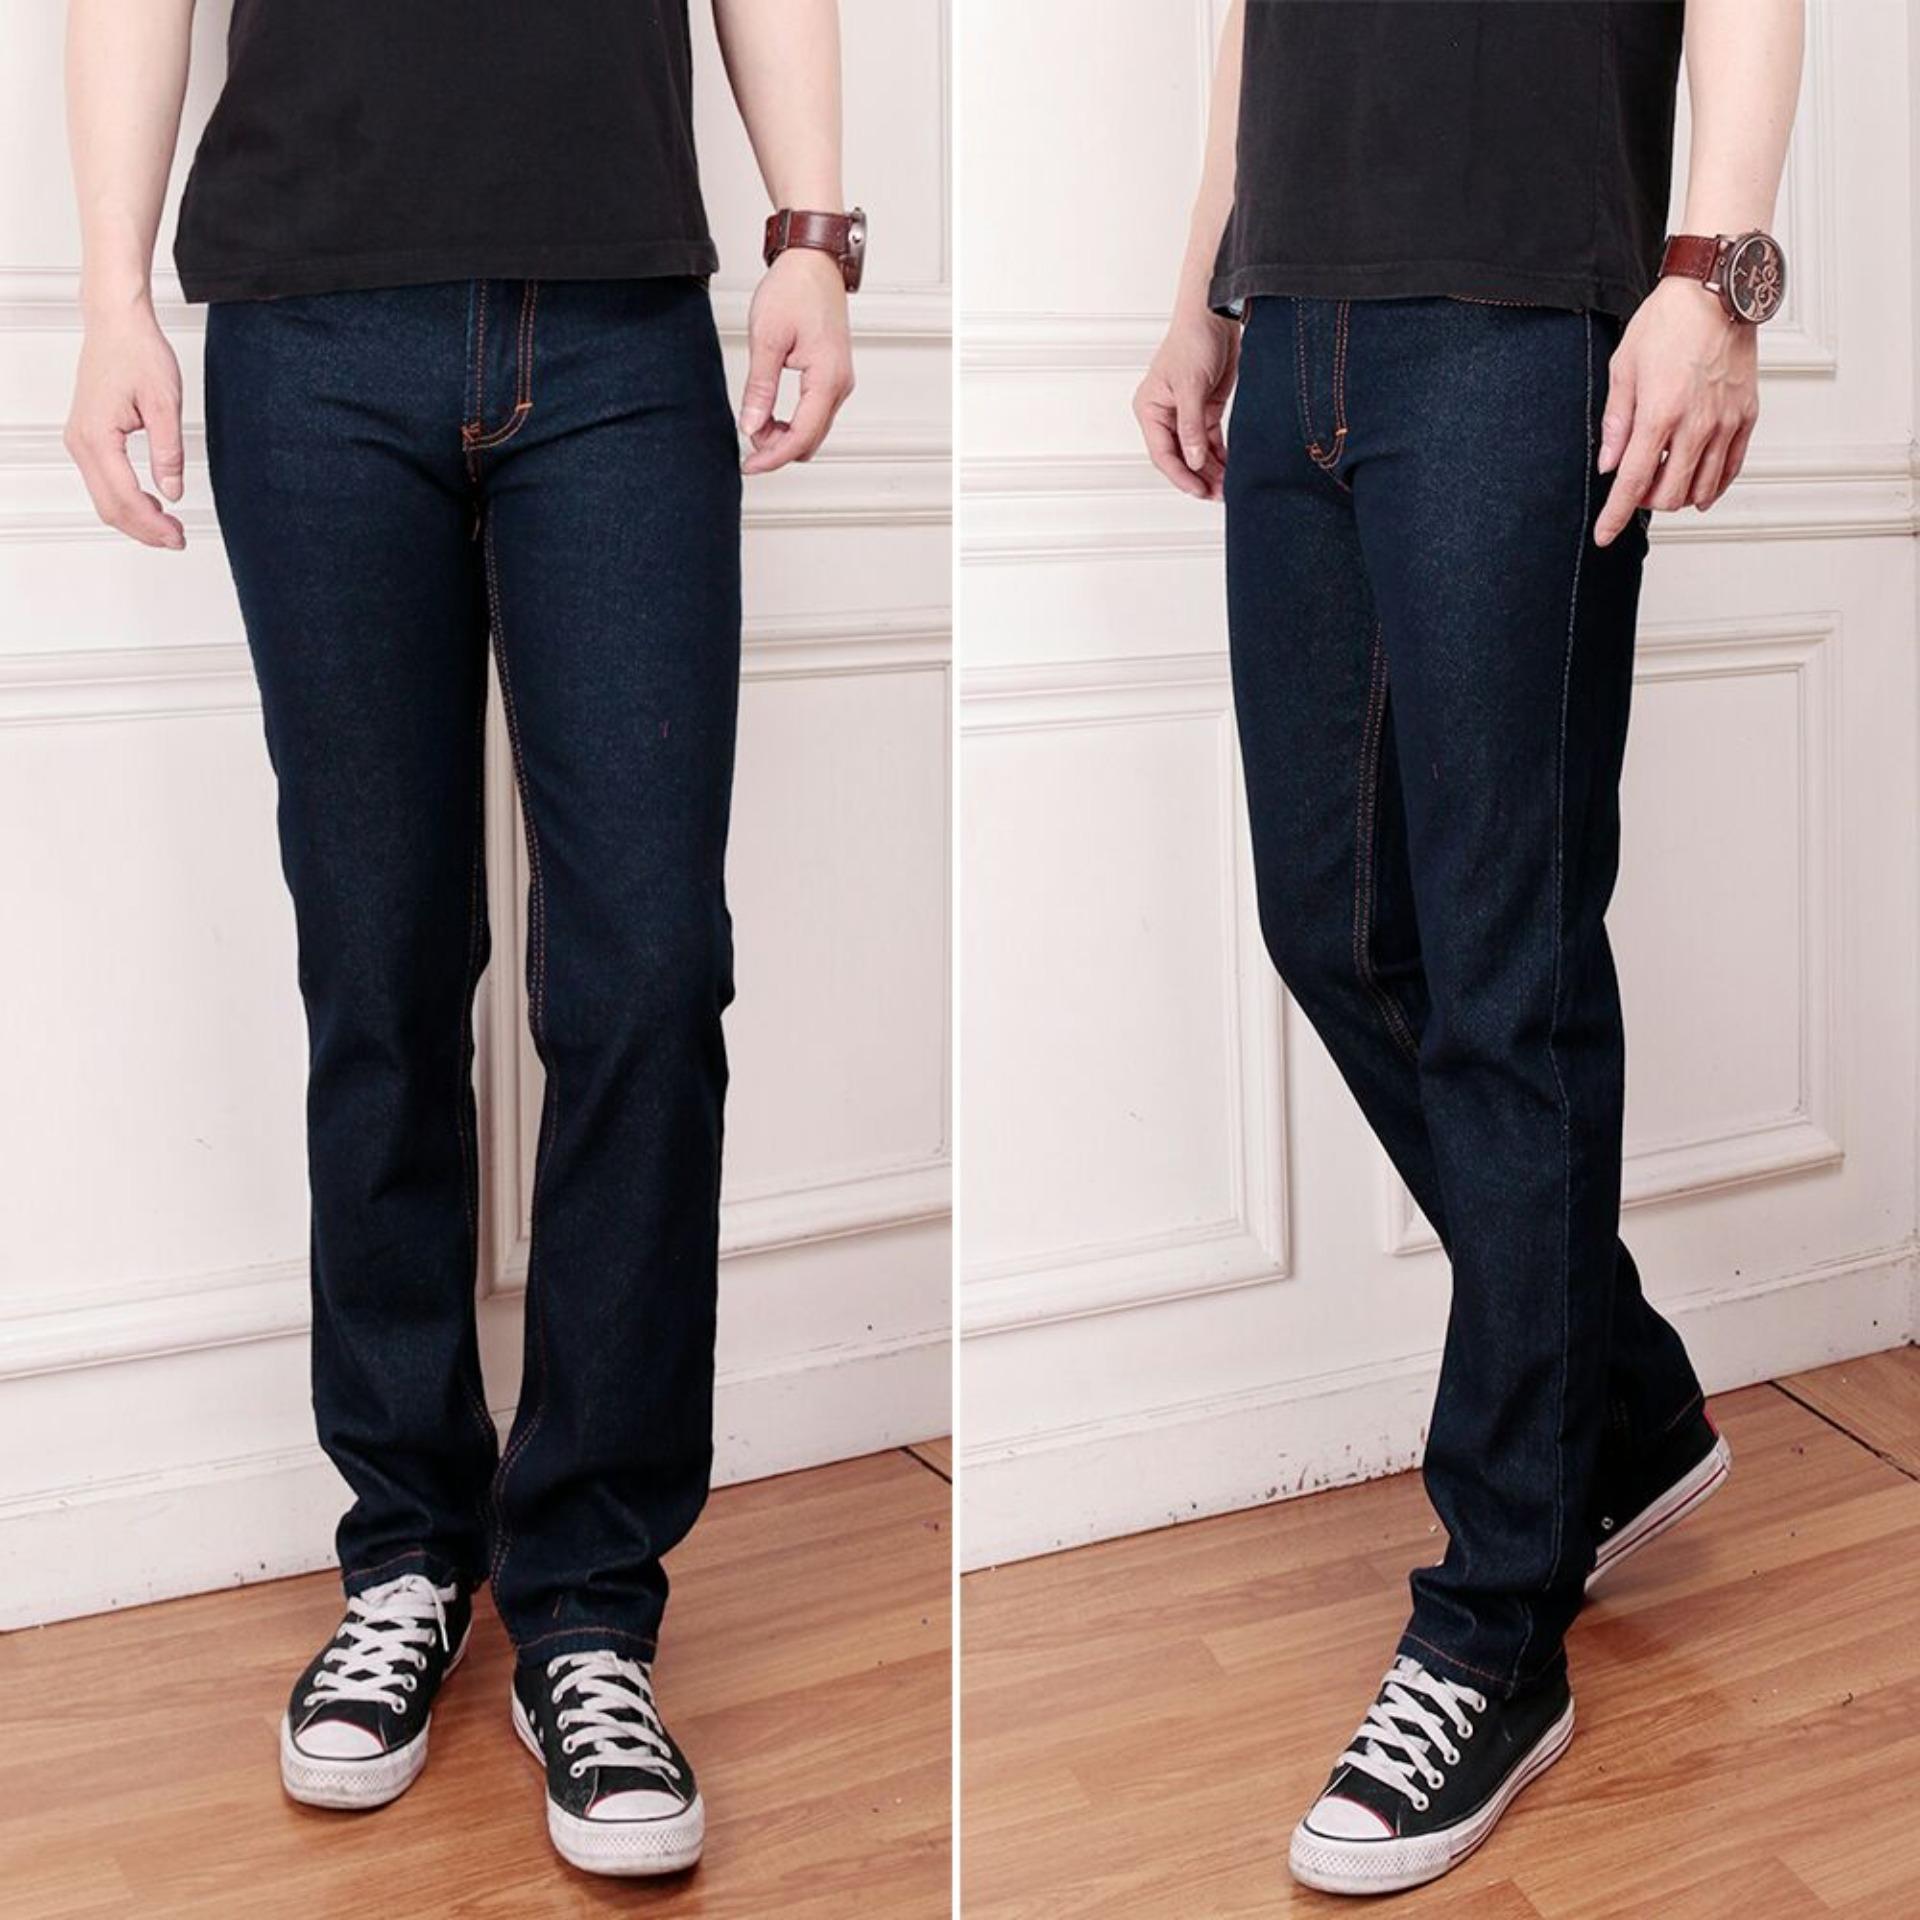 Daftar Harga Sw Celana Jeans Skinny Panjang Blueblack Update 2018 Tcash Vaganza 34 Zoya Cosmetics Natural White Facial Wash Promo Pria Garmen Biru Tua Reguler Info